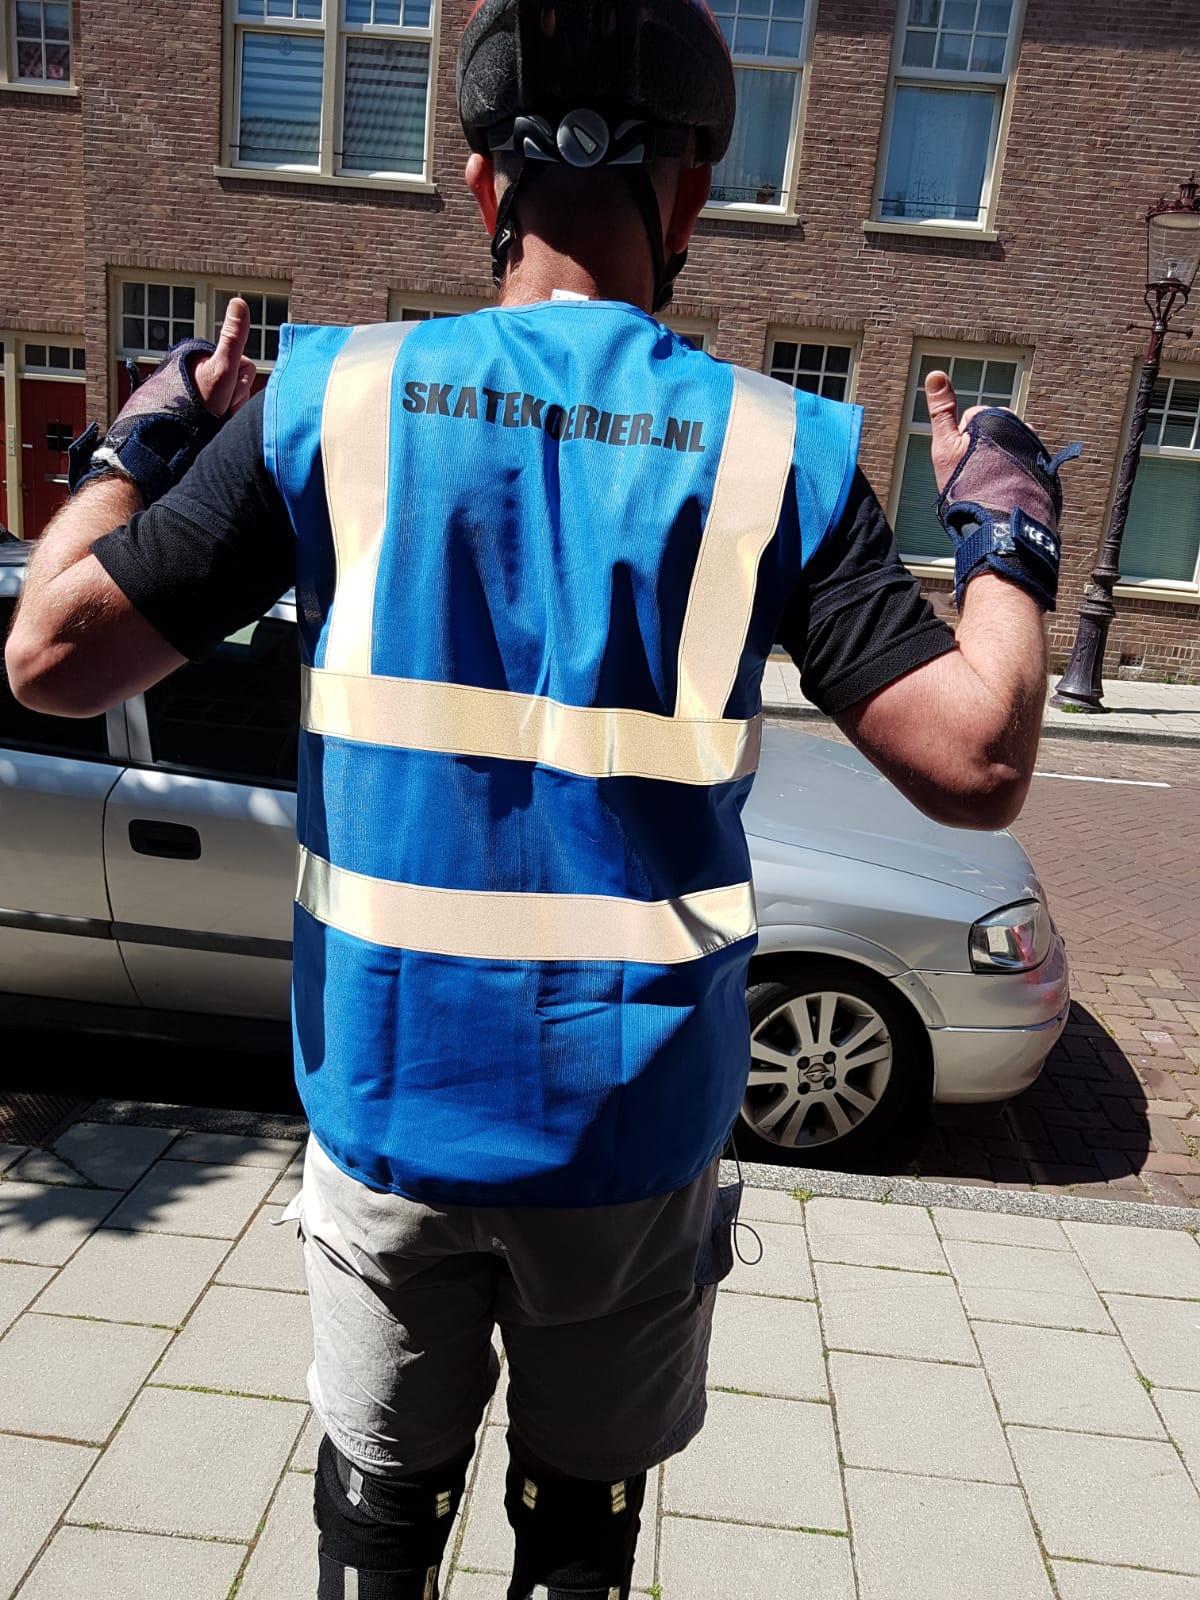 Skate-koerier Amsterdam - sportieve bezorger - snelle delivery boy - spoedzending - klimaatneutraal